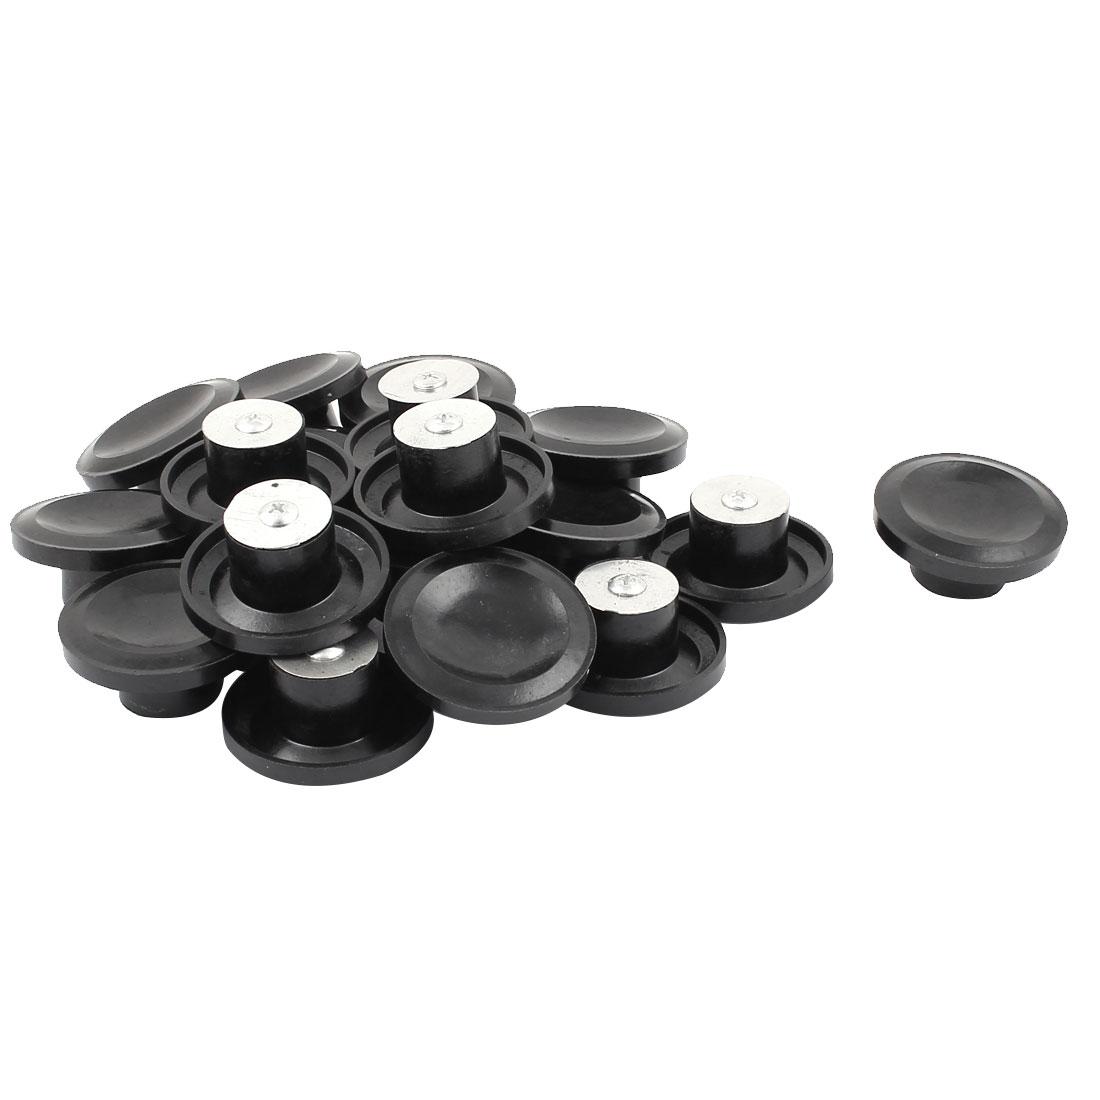 Cooker Cooking Utensils Plastic Pot Pan Cover Lid Helper Handle Handgrip Knob 55mm Dia 20pcs